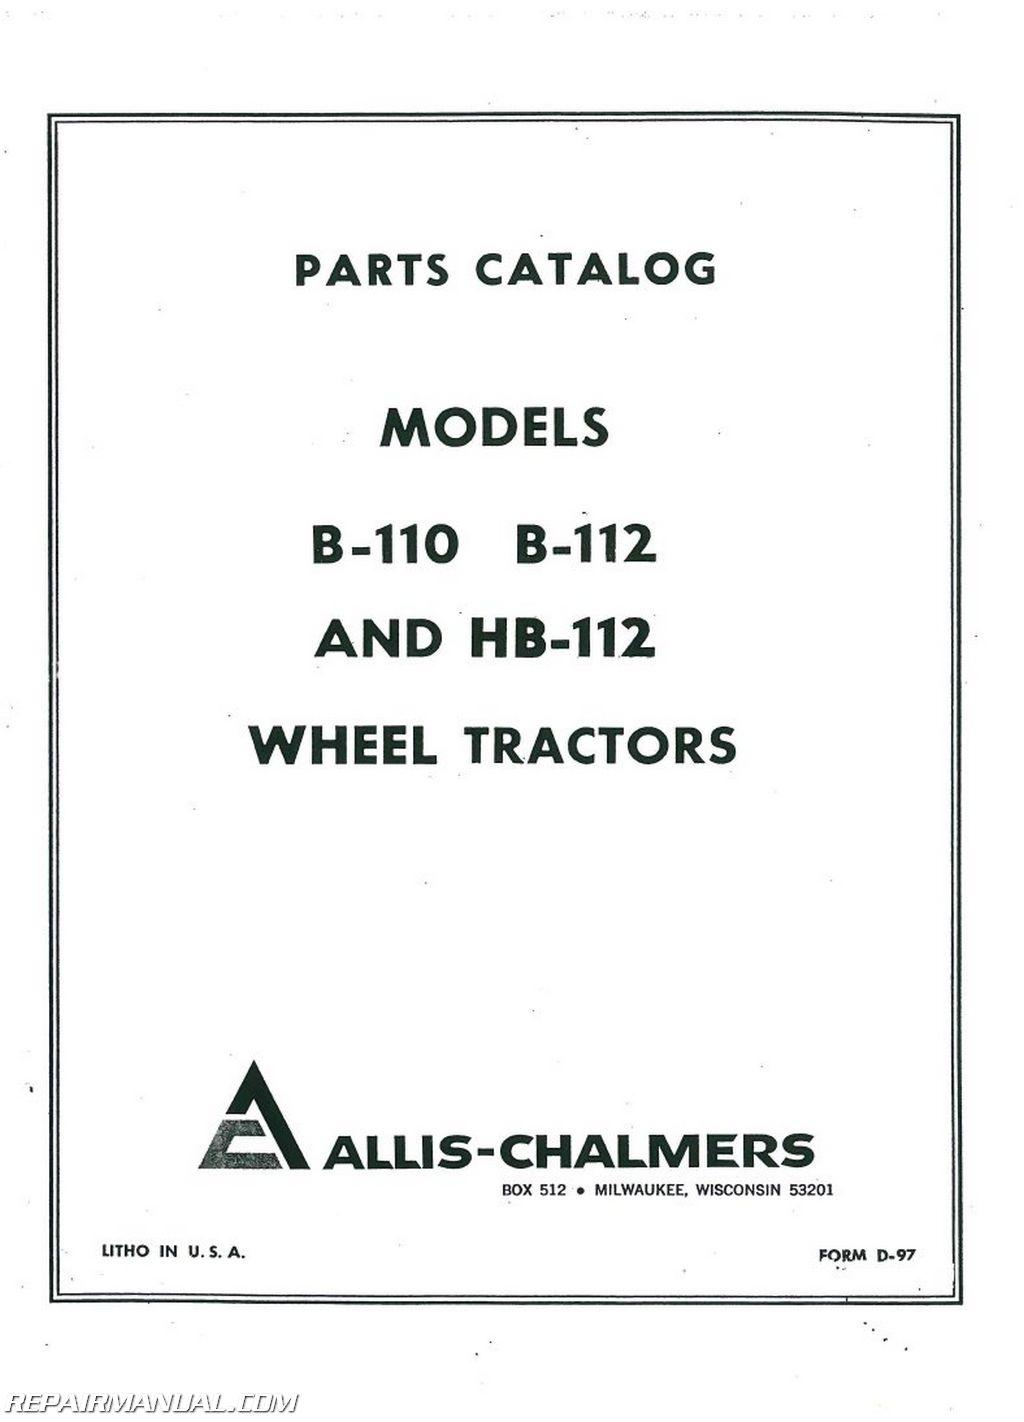 allis chalmers b110 b112 hb112 lawn garden tractor parts manual